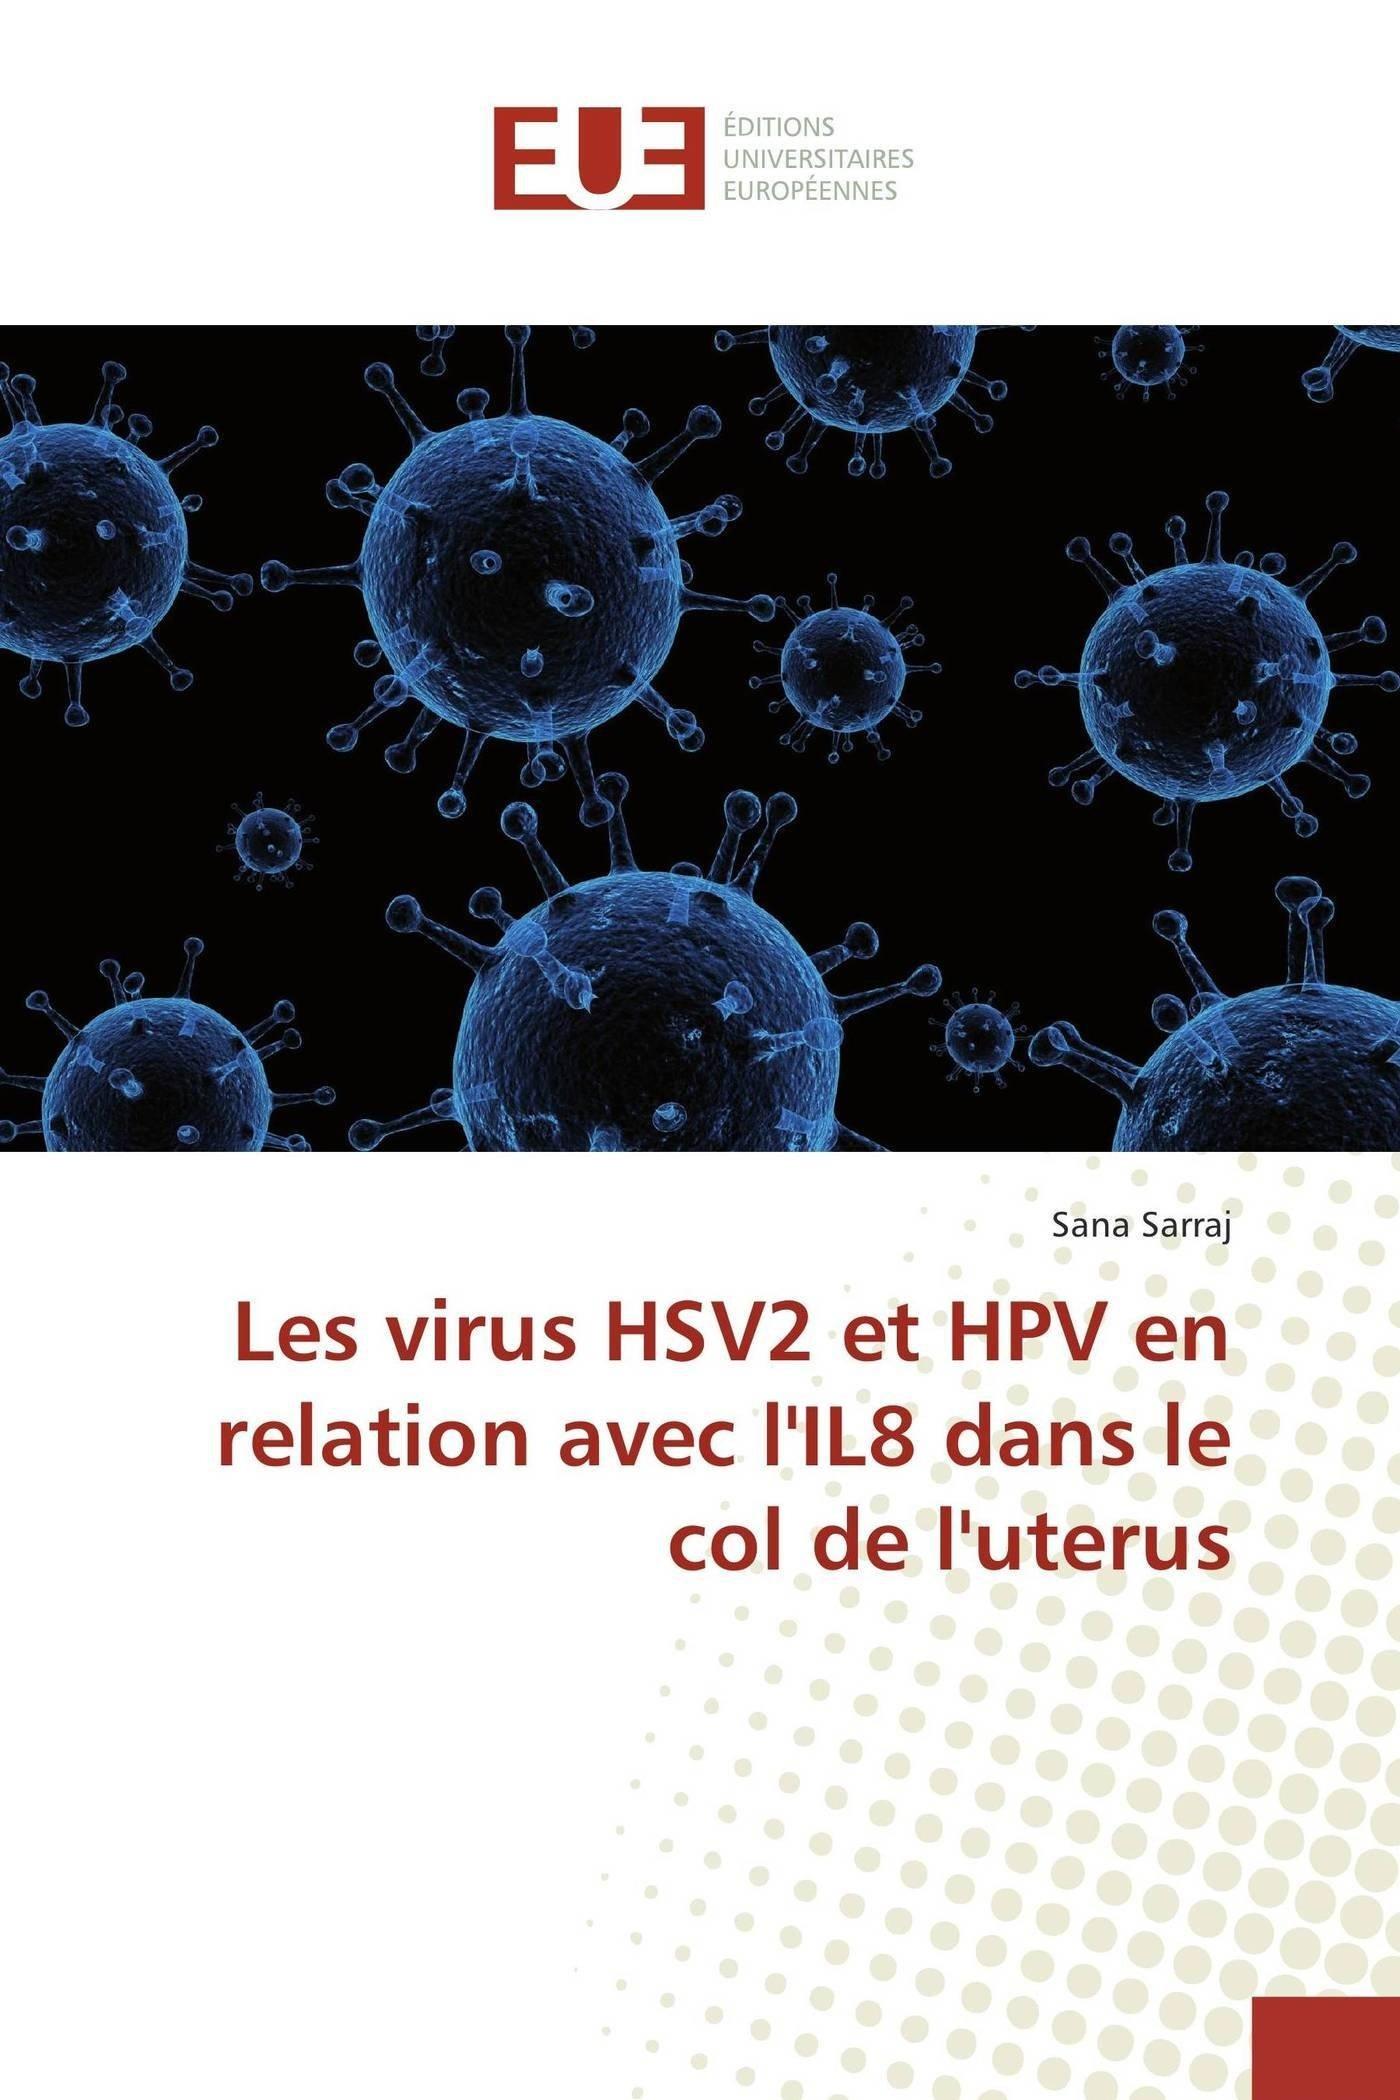 cancer du col de luterus virus hpv warts on hands patient uk